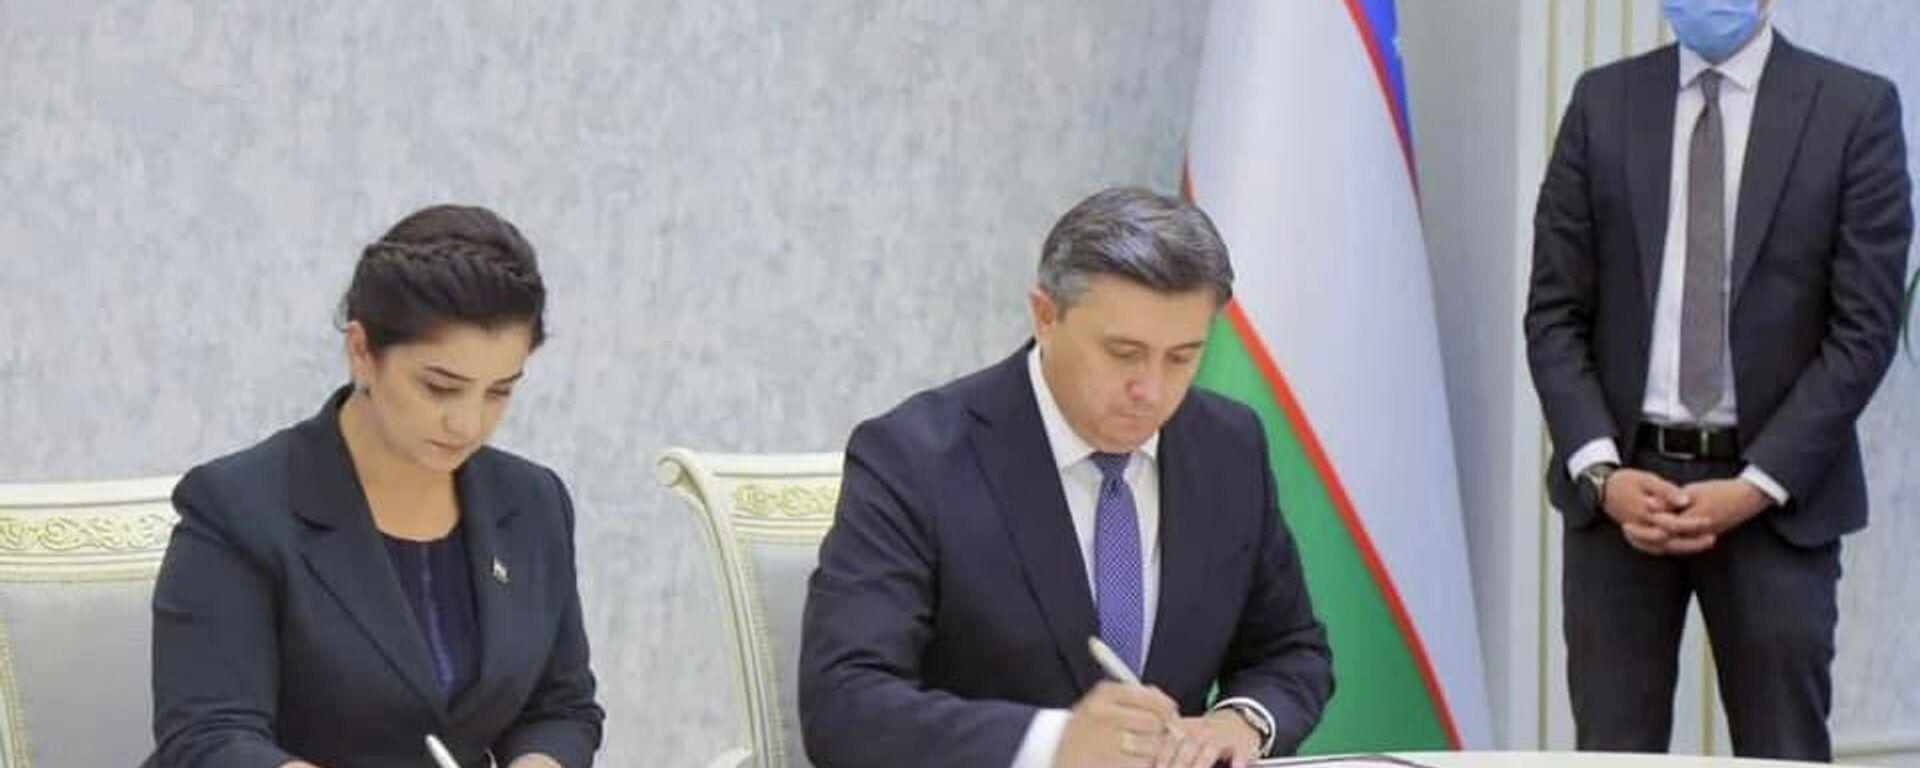 Минтруд Таджикистана и Узбекистана подписали 2 соглашения - Sputnik Таджикистан, 1920, 10.08.2021